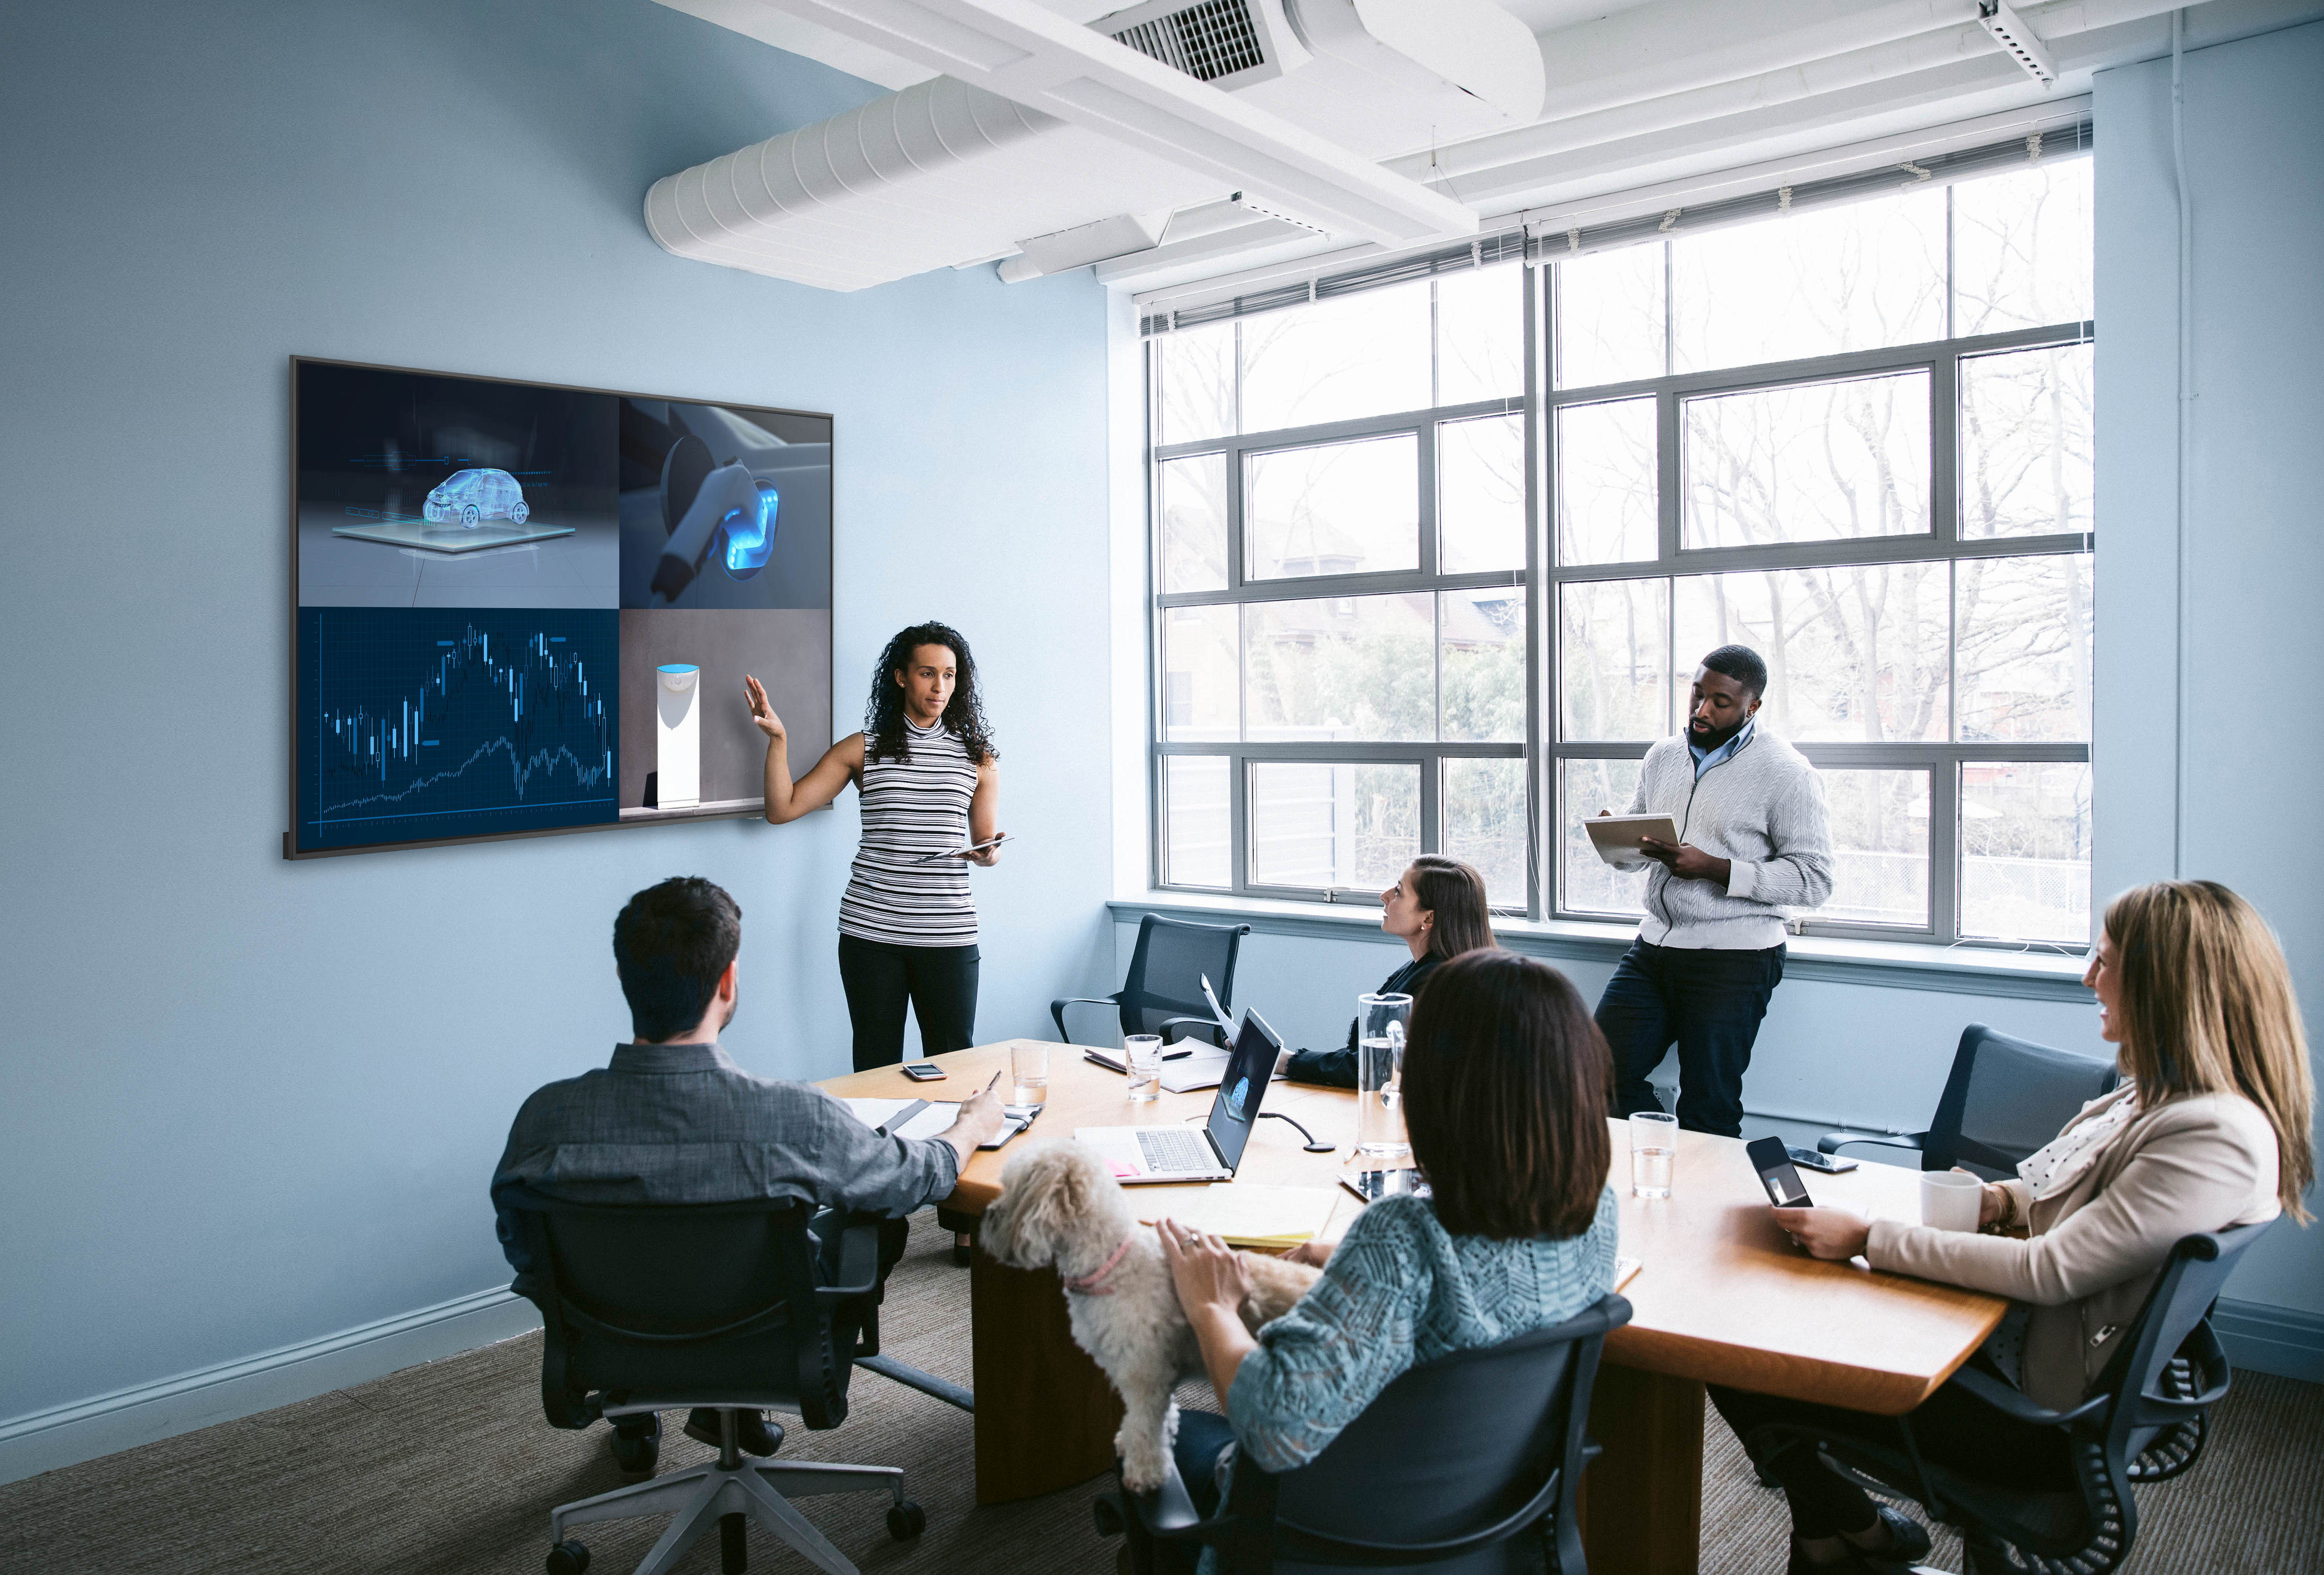 Wireless Presentation Display Solutions